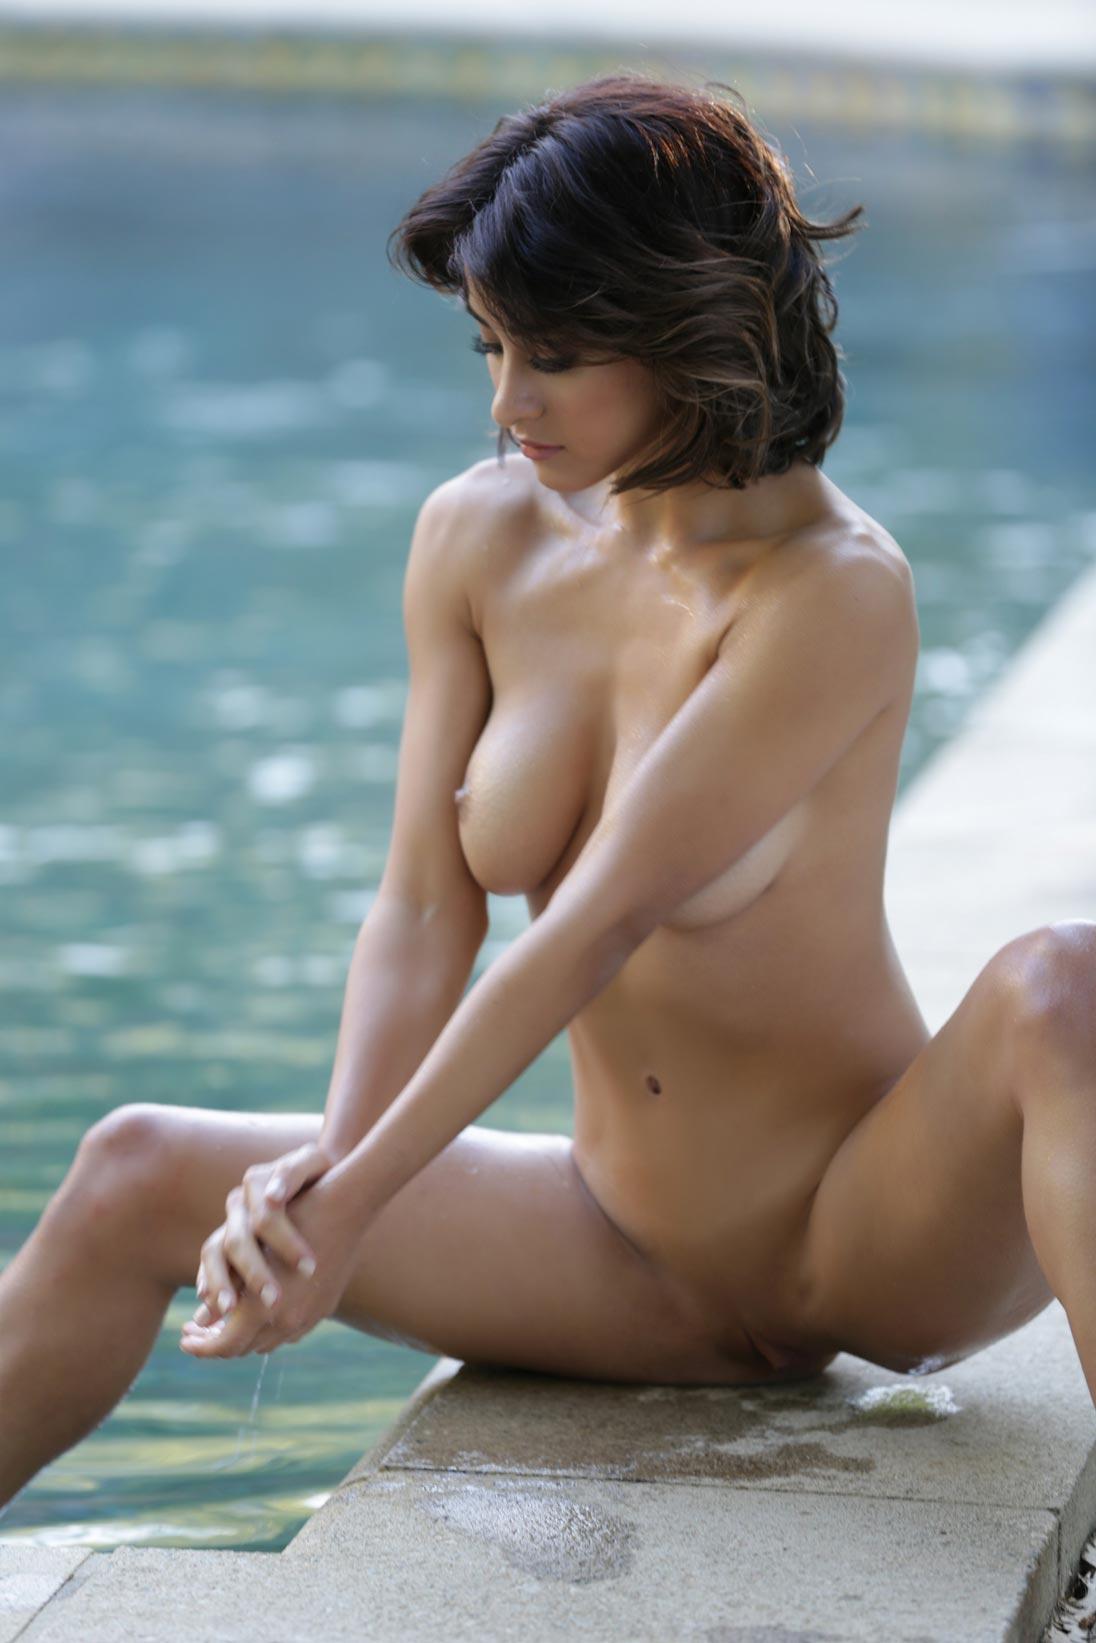 Matthew ludwinski nude